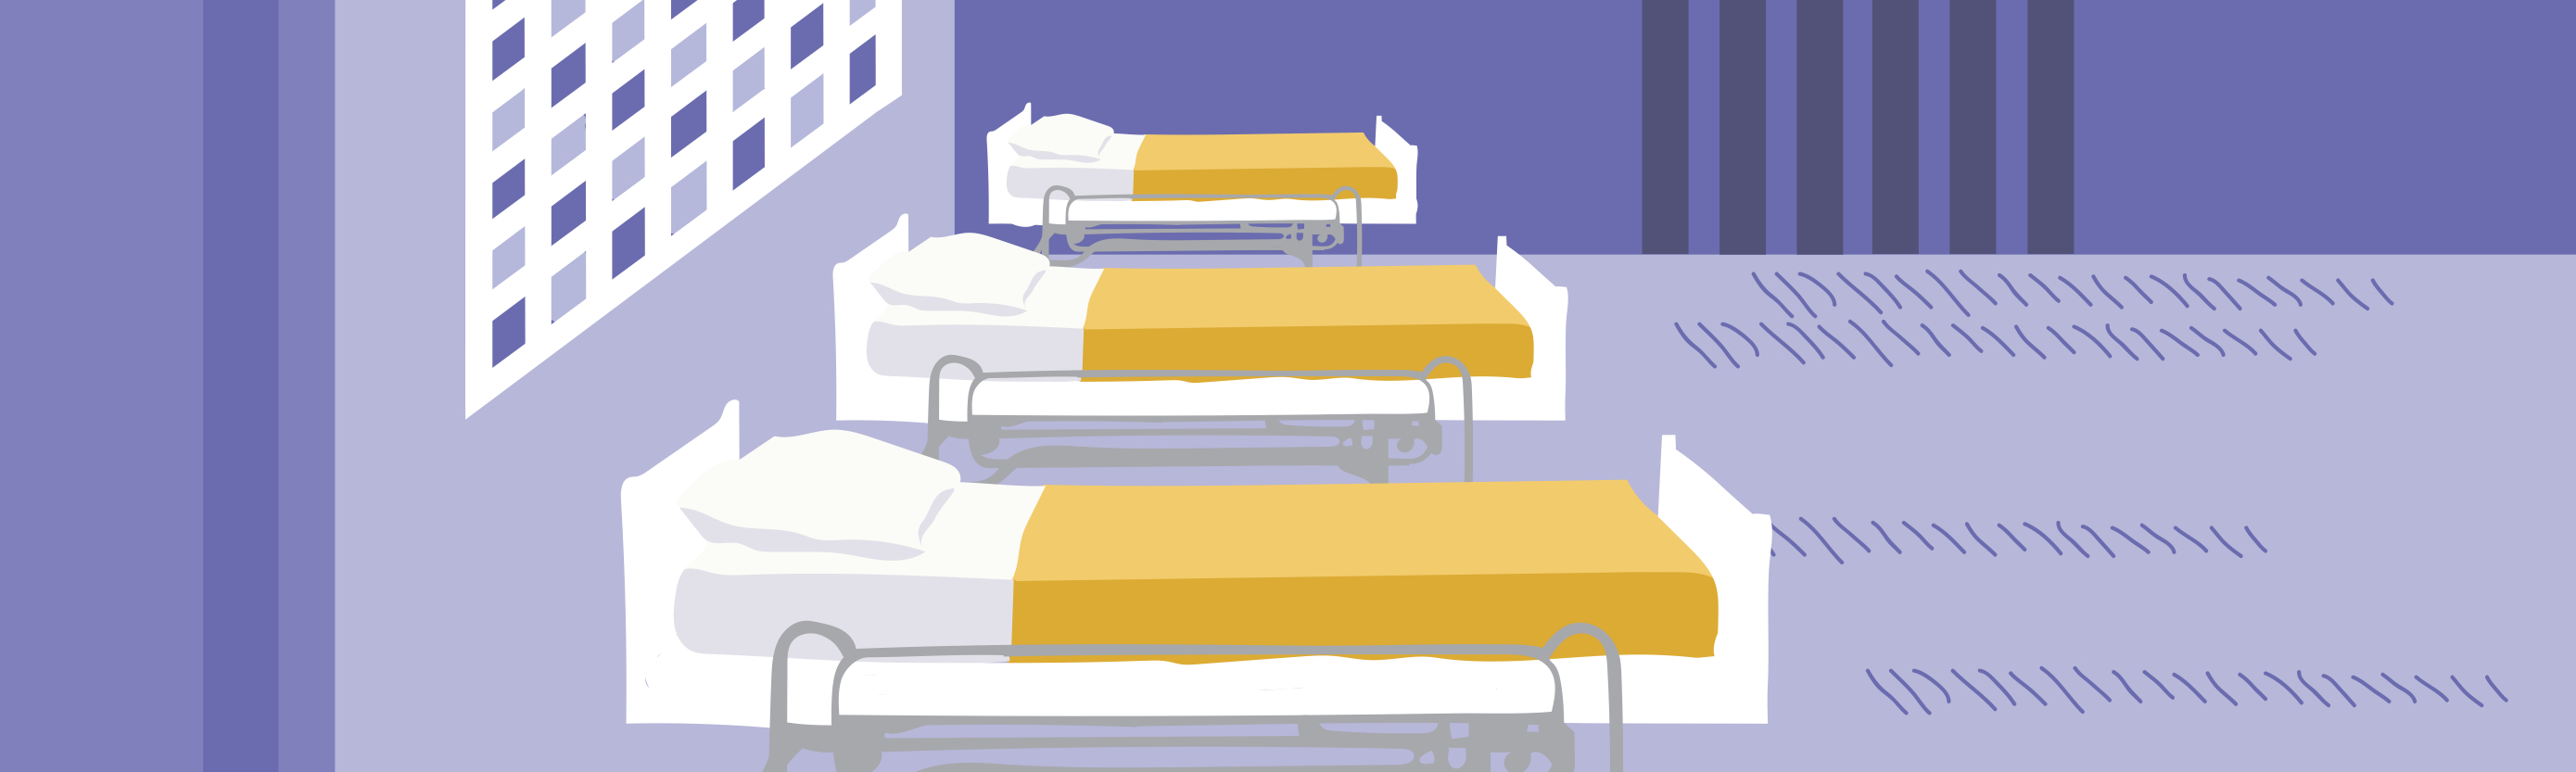 Hospital Design Banner